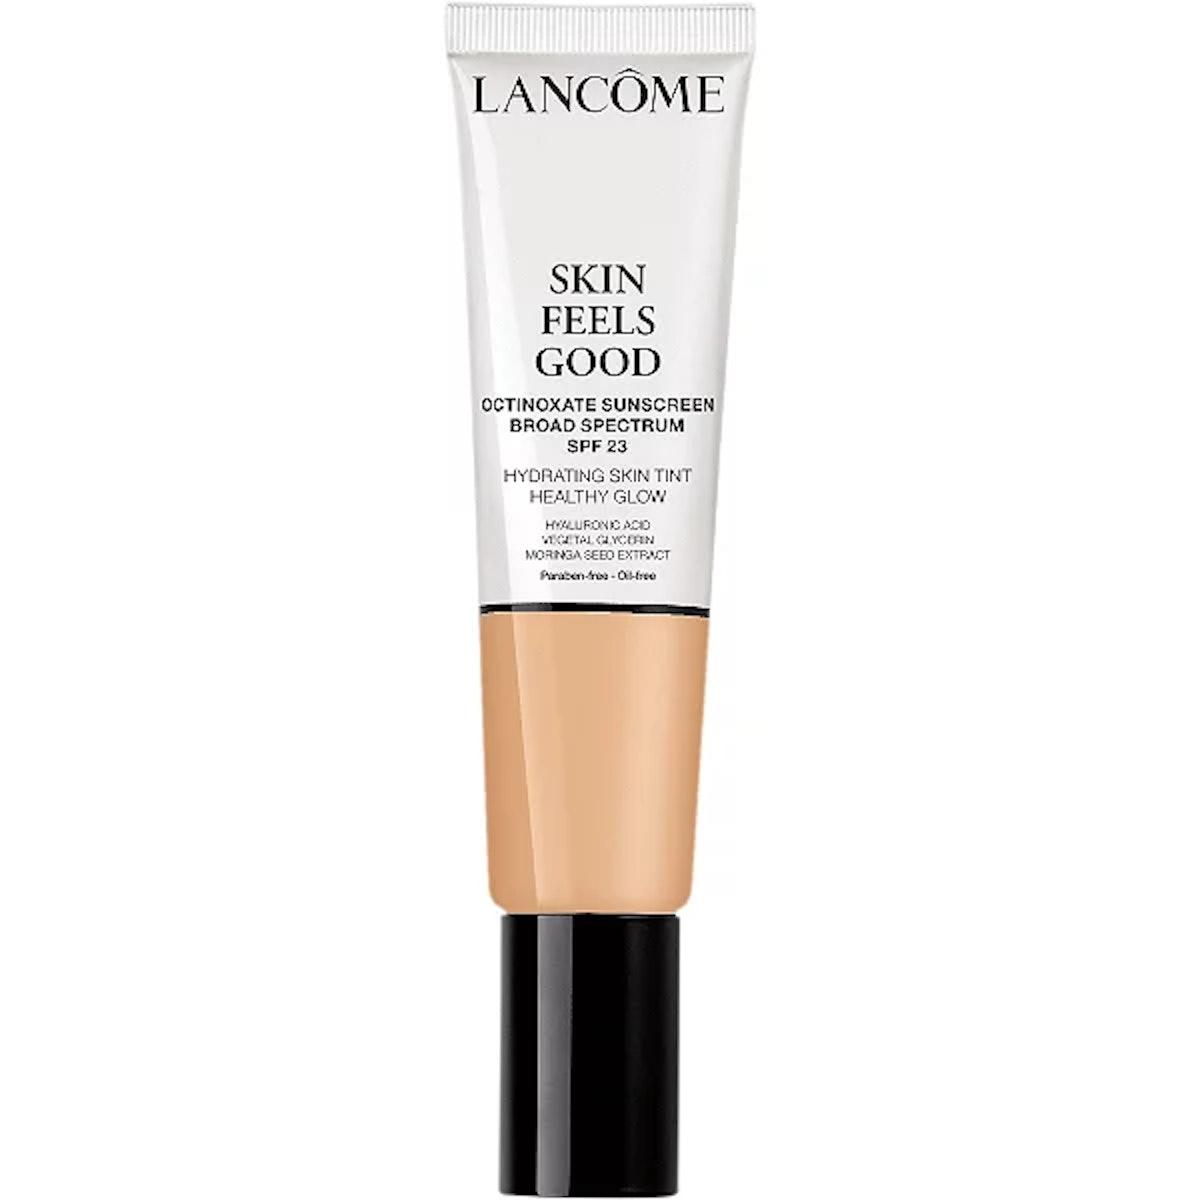 Lancôme Skin Feels Good Hydrating Tinted Moisturizer